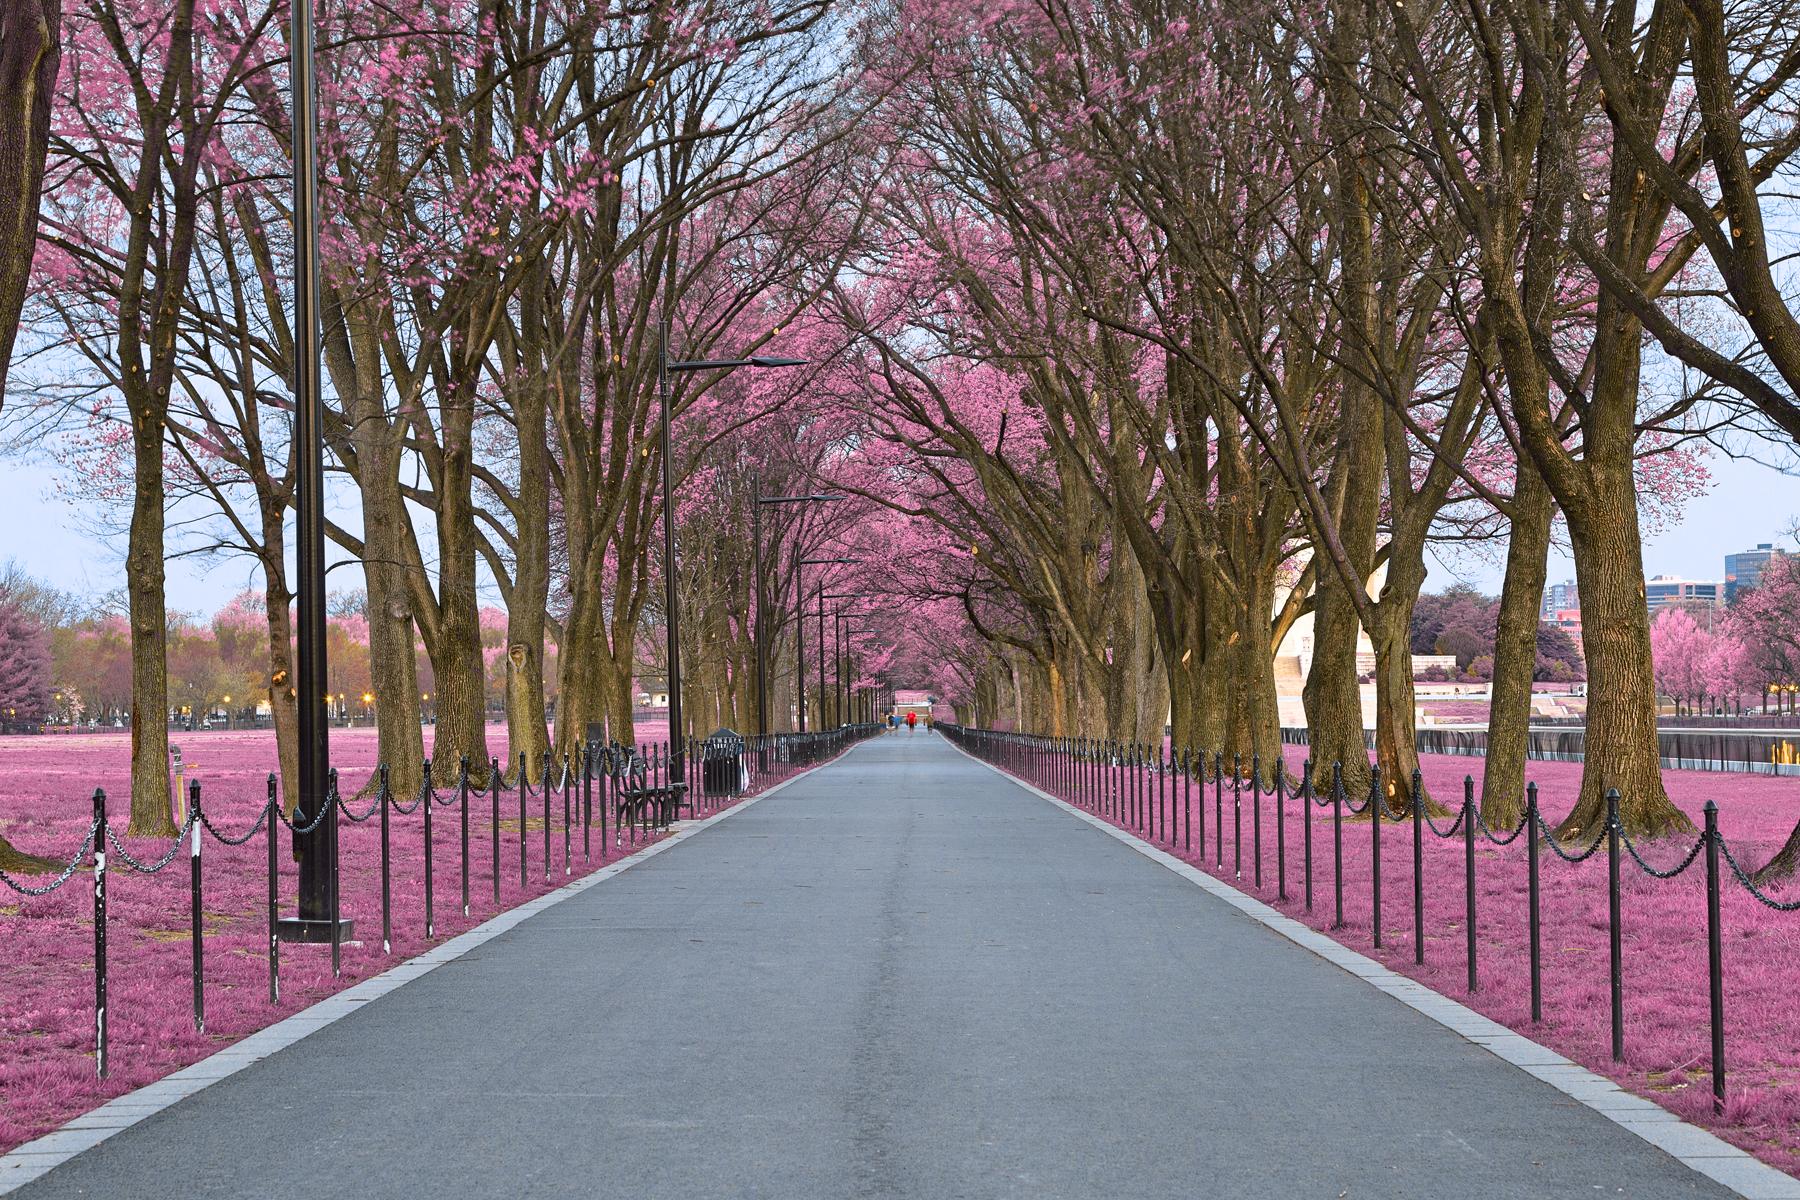 National Mall Promenade - Pink HDR, America, Railing, Shadow, Shades, HQ Photo